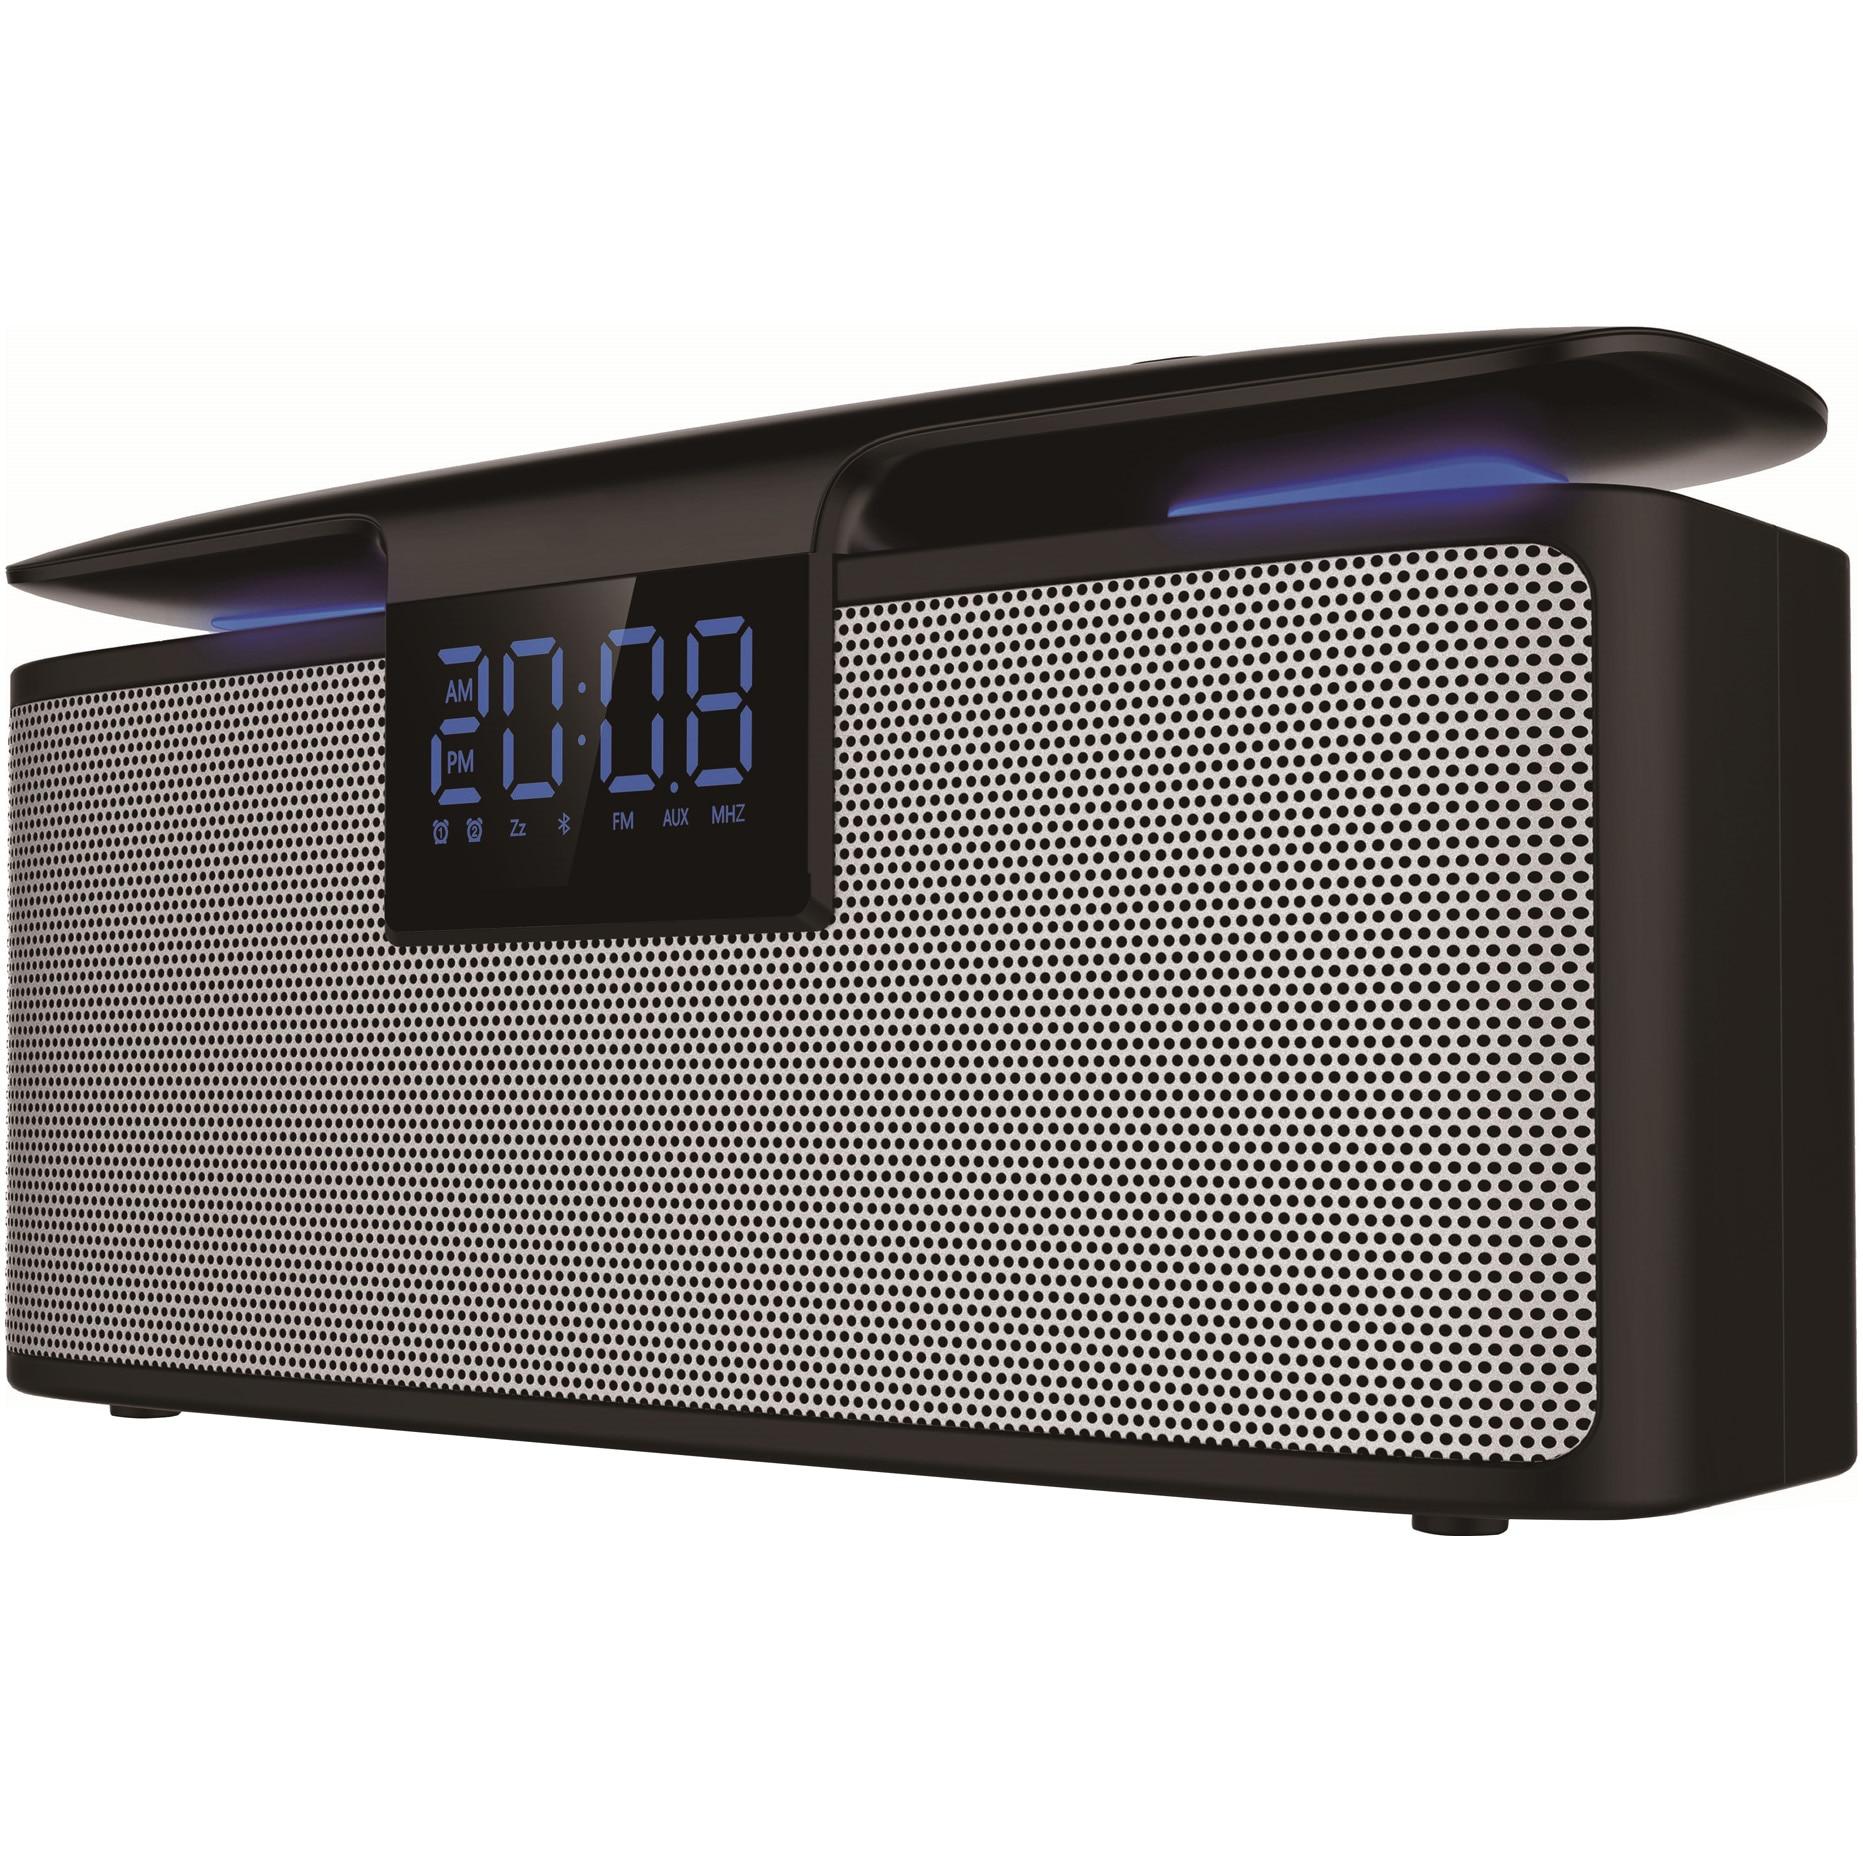 Fotografie Boxa Portabila AKAI ABTS-M10, Bluetooth, Radio Ceas, USB, TF Card